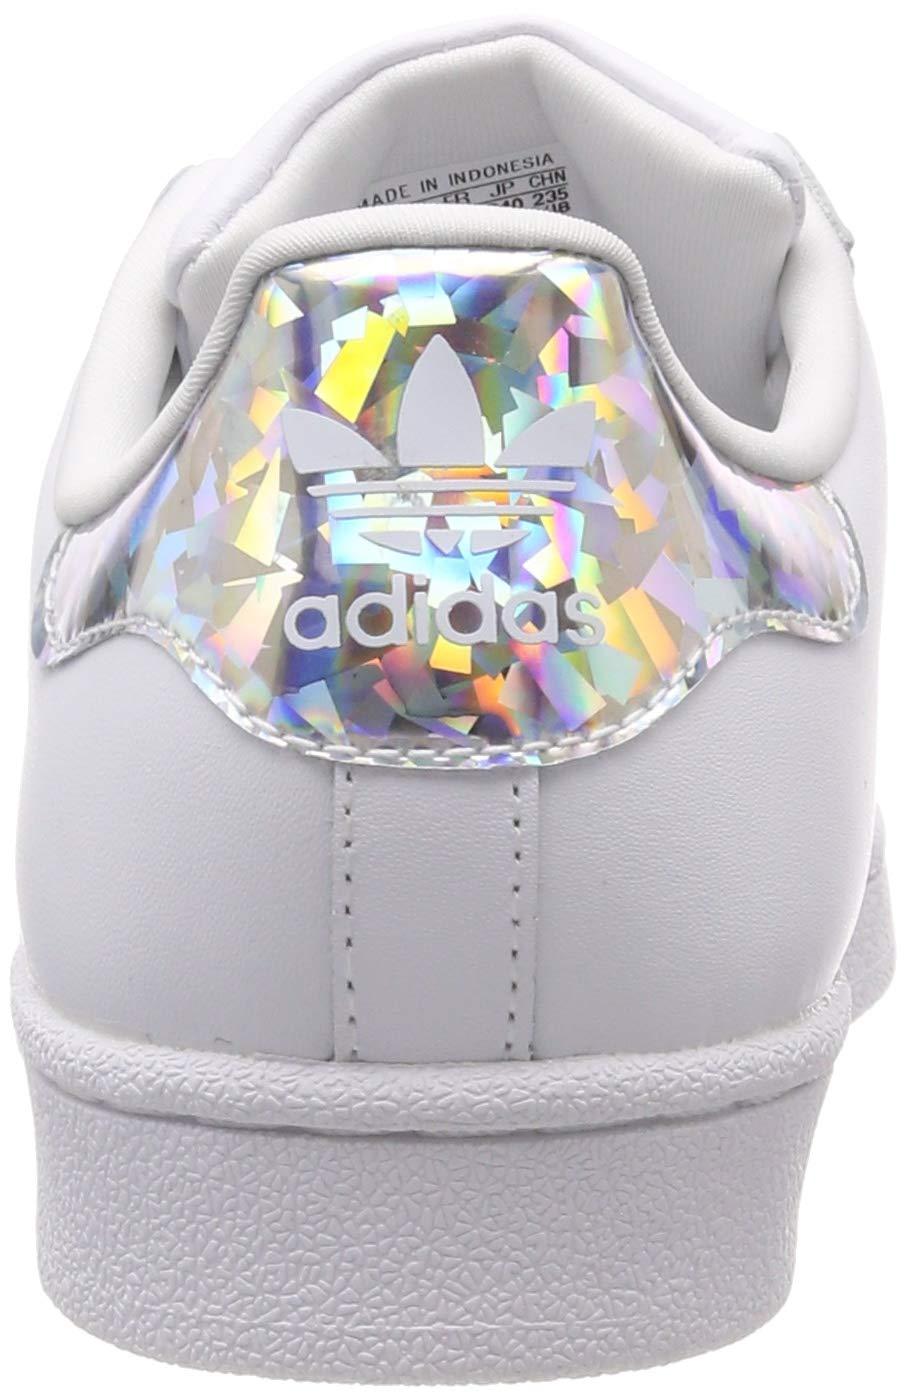 adidas Superstar J, Scarpe da Ginnastica Unisex-Bambini 2 spesavip